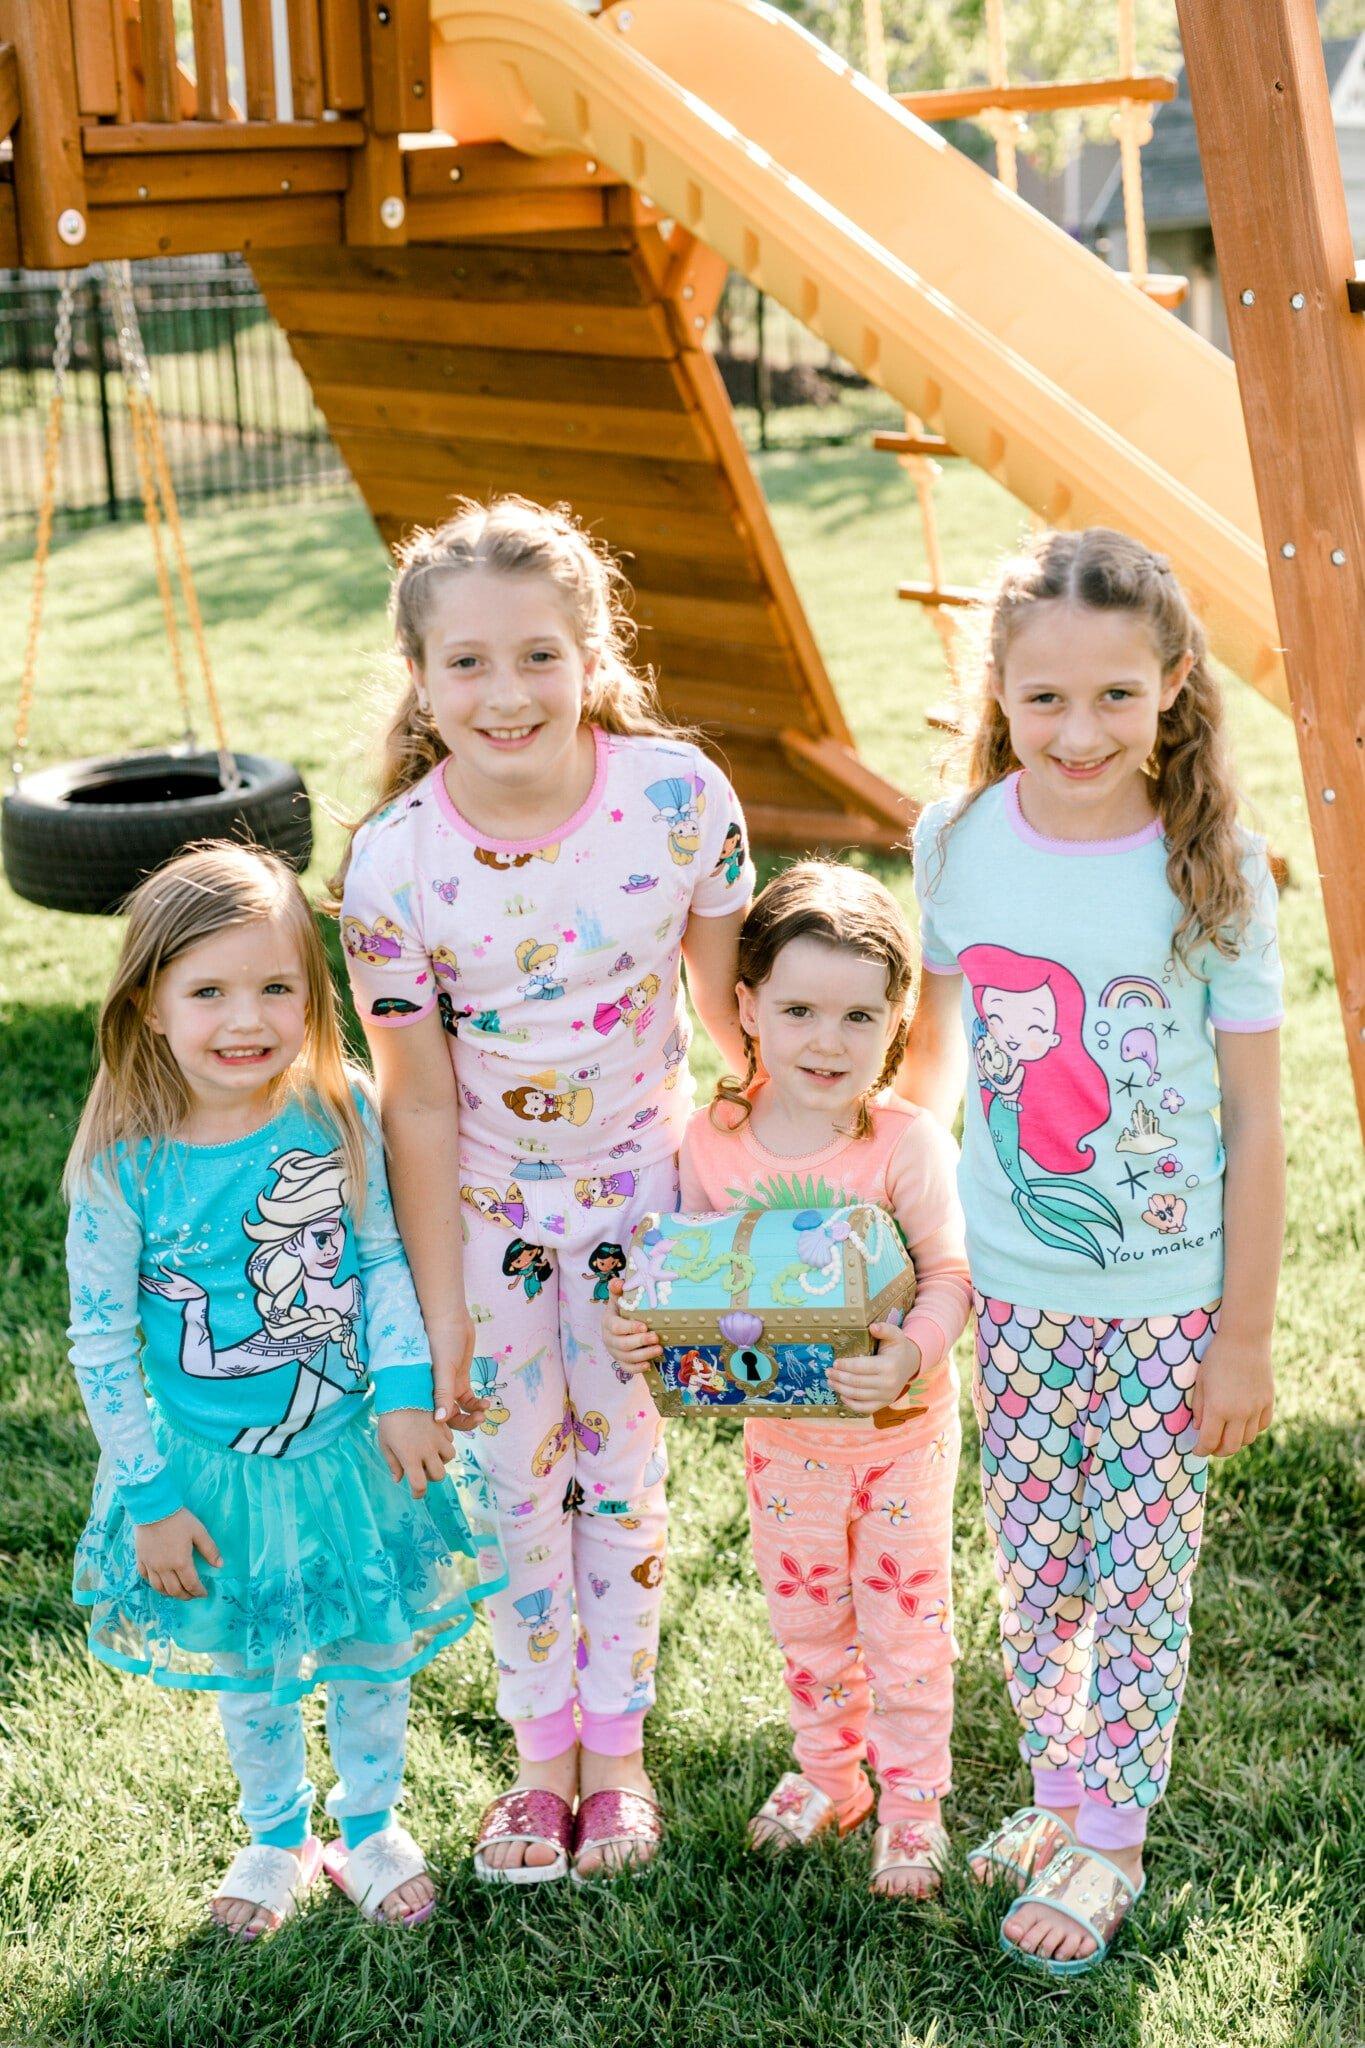 girls standing together in princess pajamas